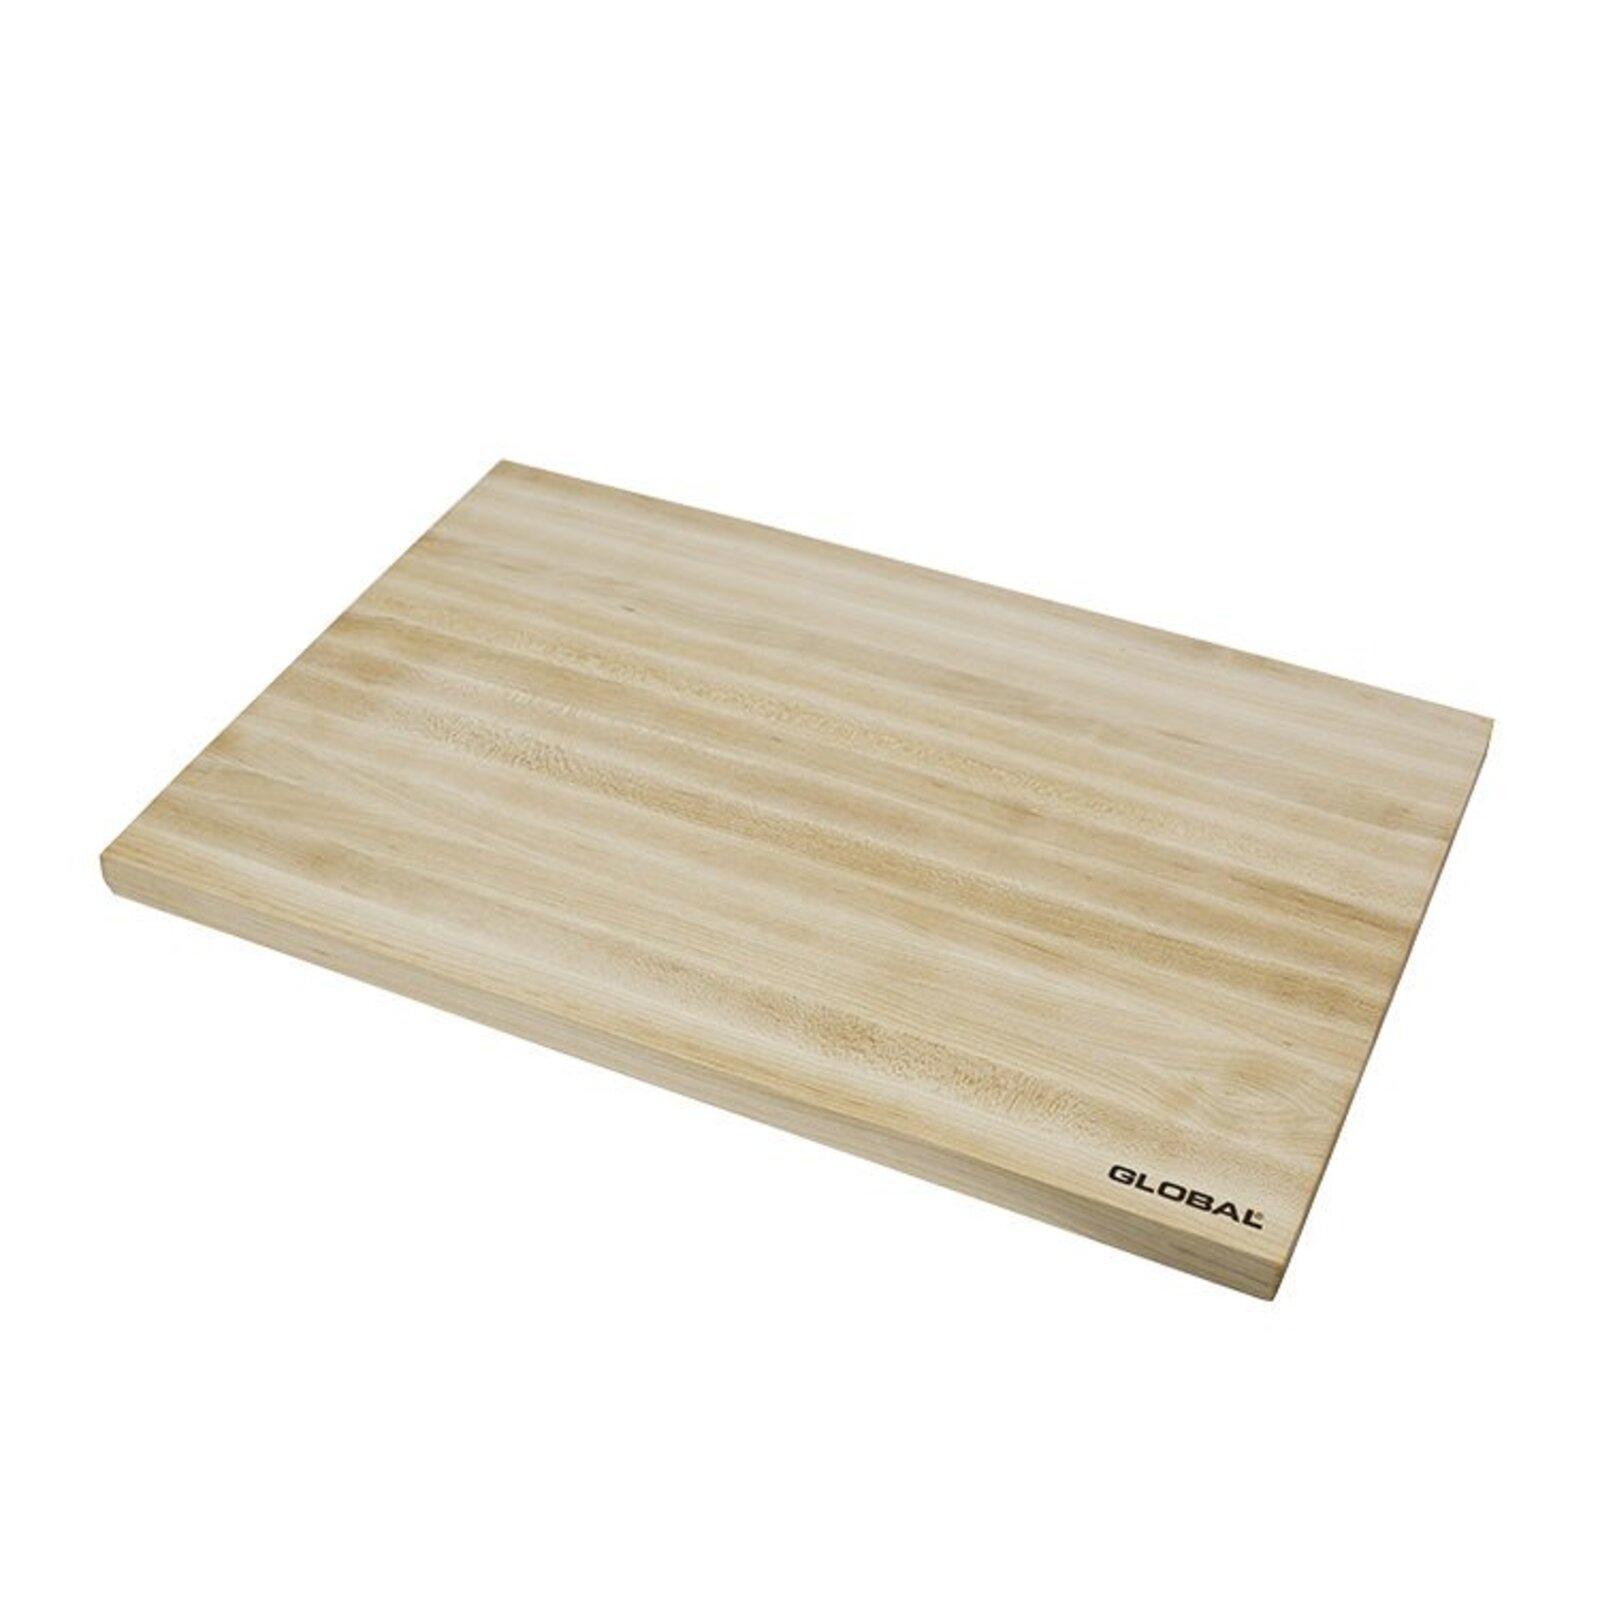 Global Maple Prep Board 45x30x2cm